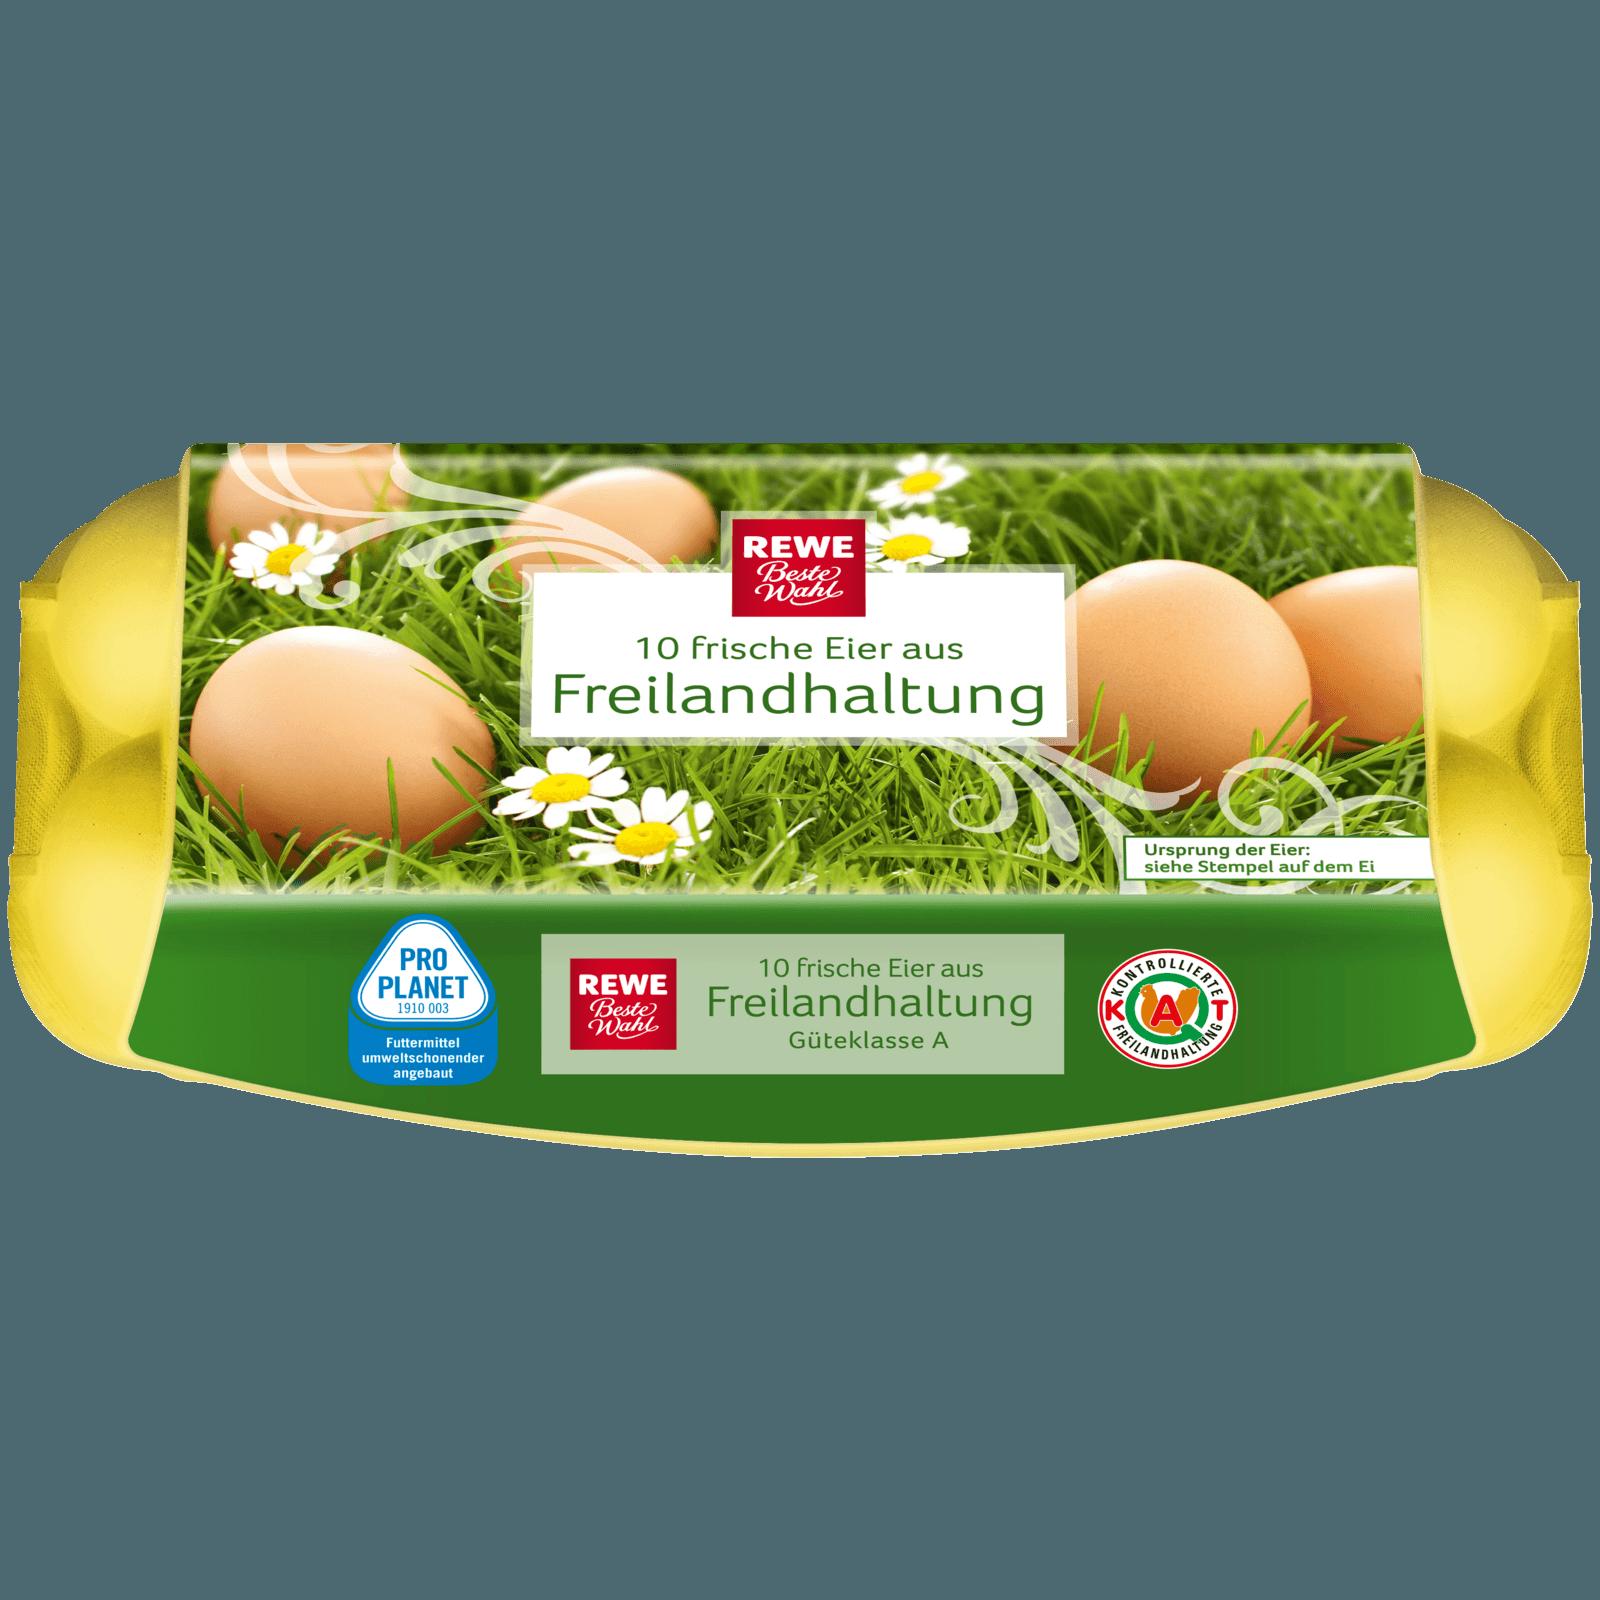 REWE Beste Wahl Eier Freilandhaltung Klasse M-L 10 Stück